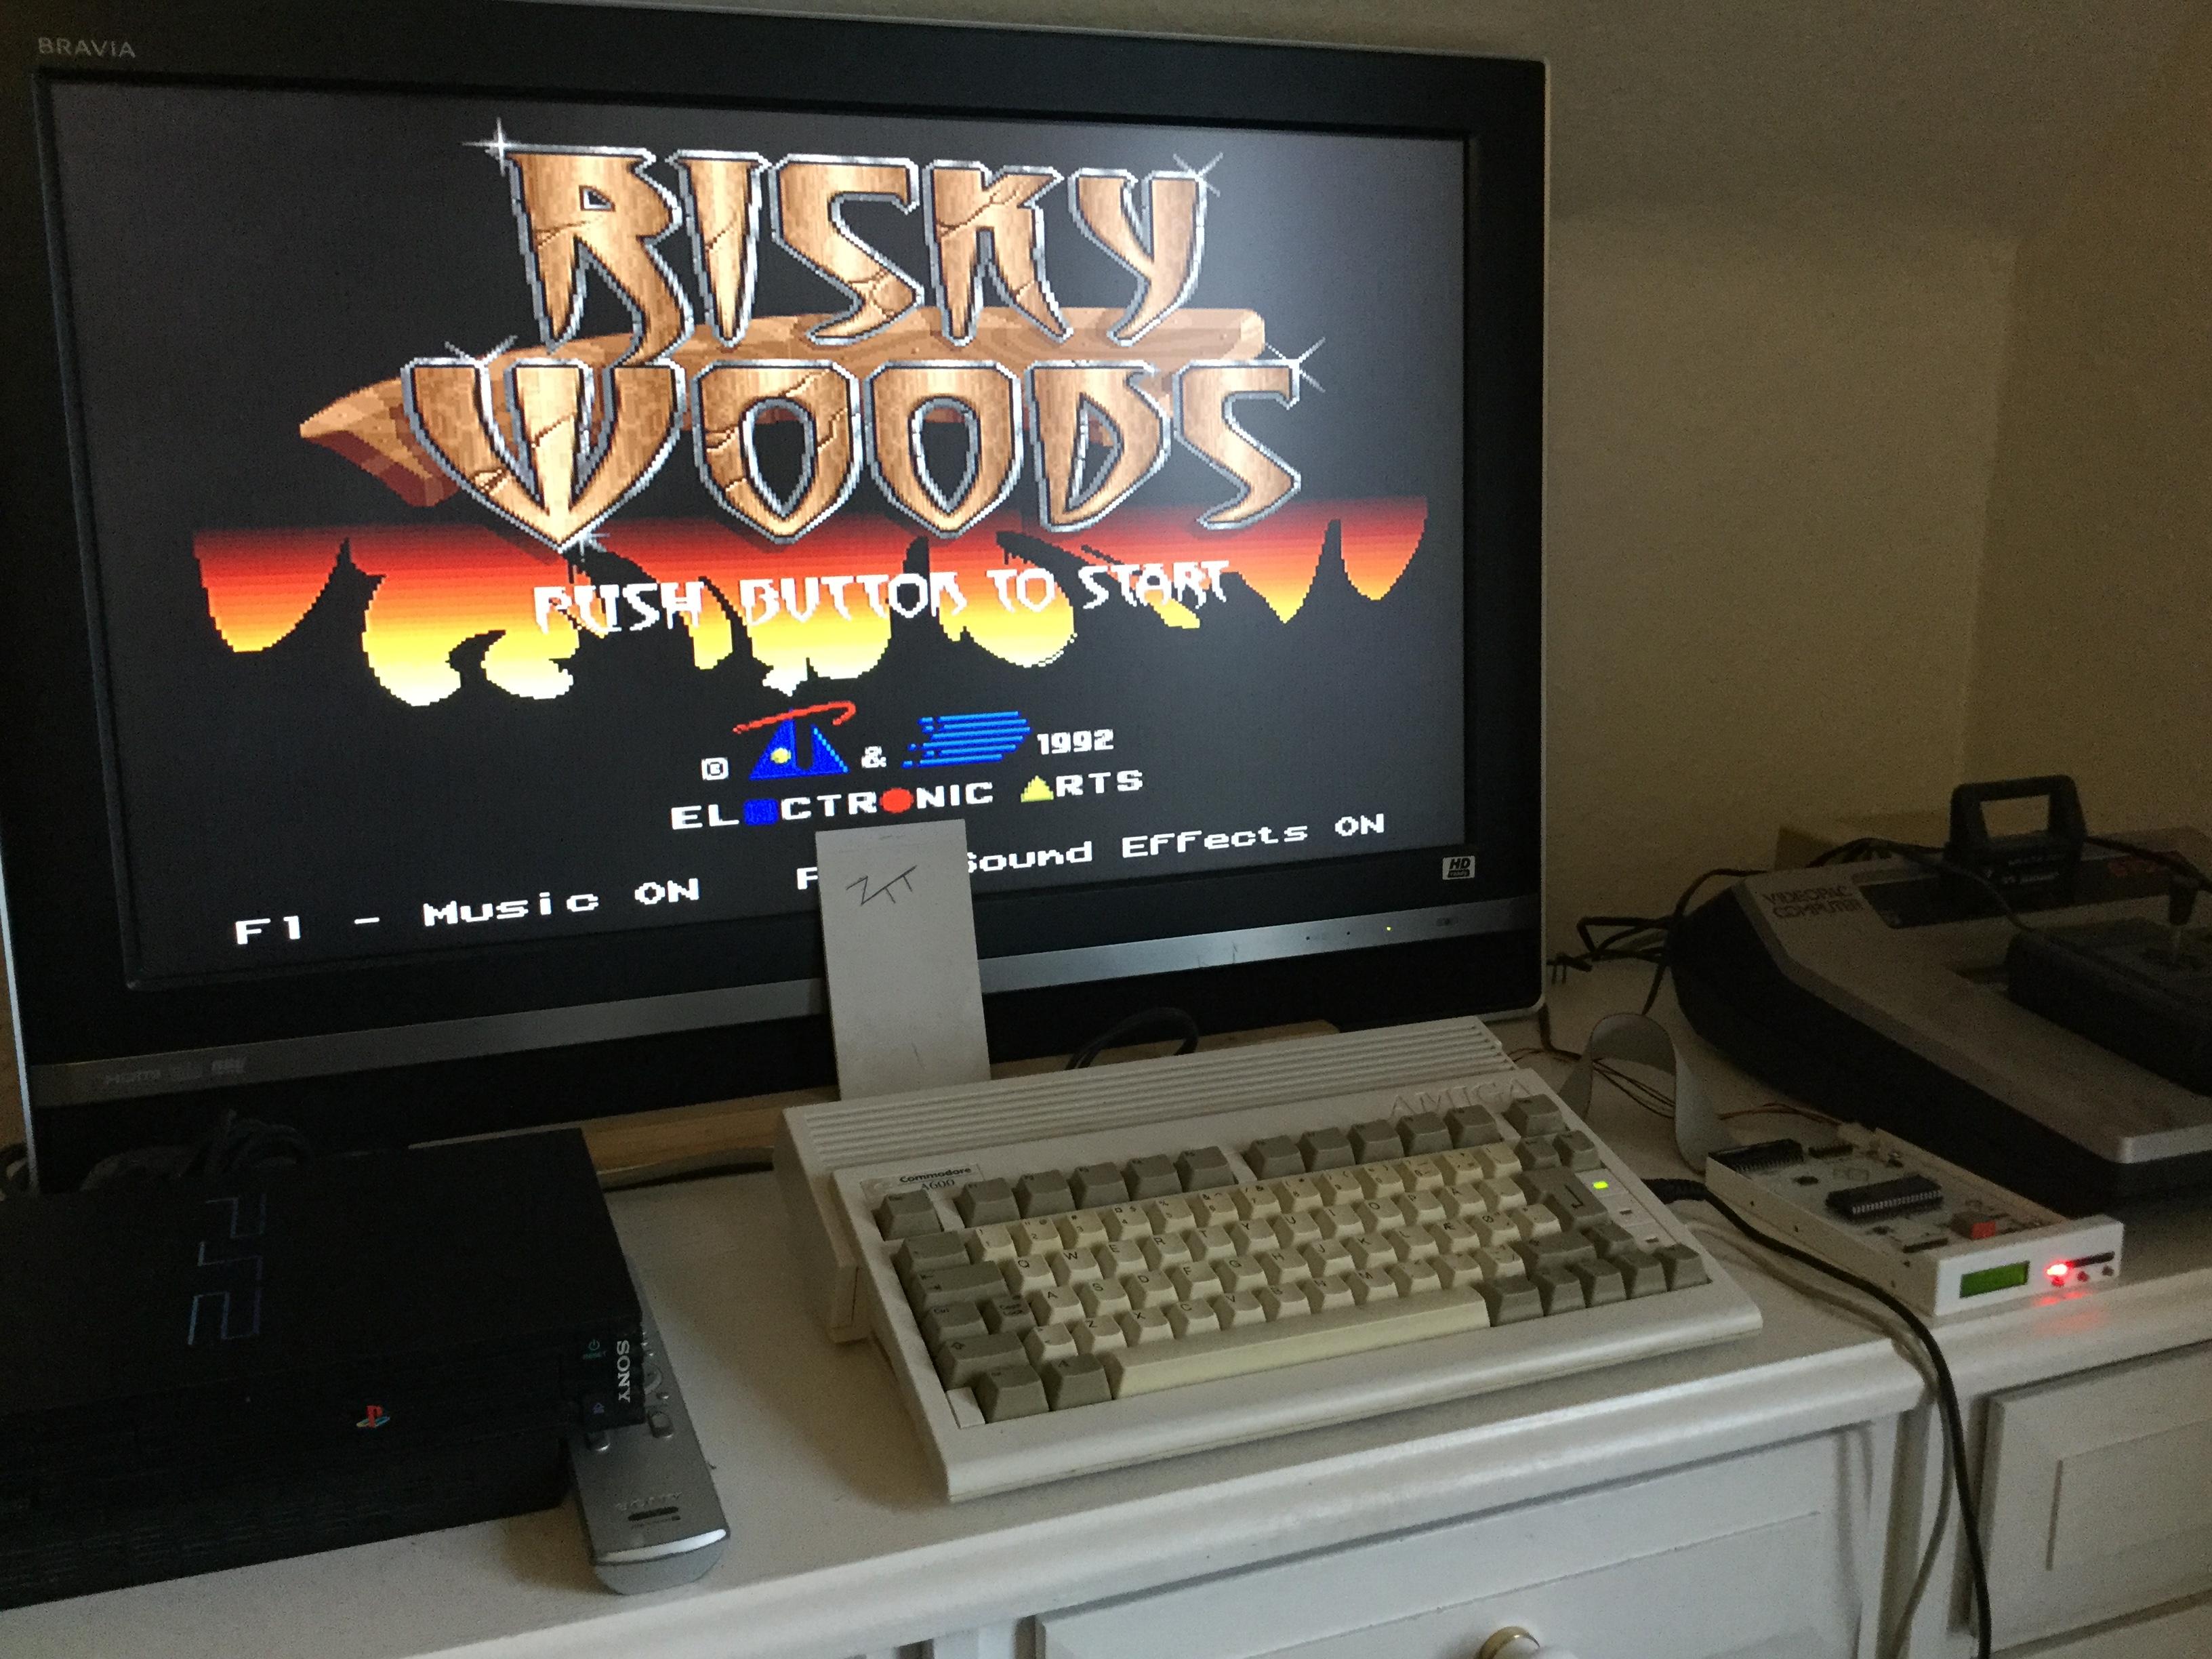 Frankie: Risky Woods [Electronic Arts] (Amiga) 114,584 points on 2017-10-22 06:32:54